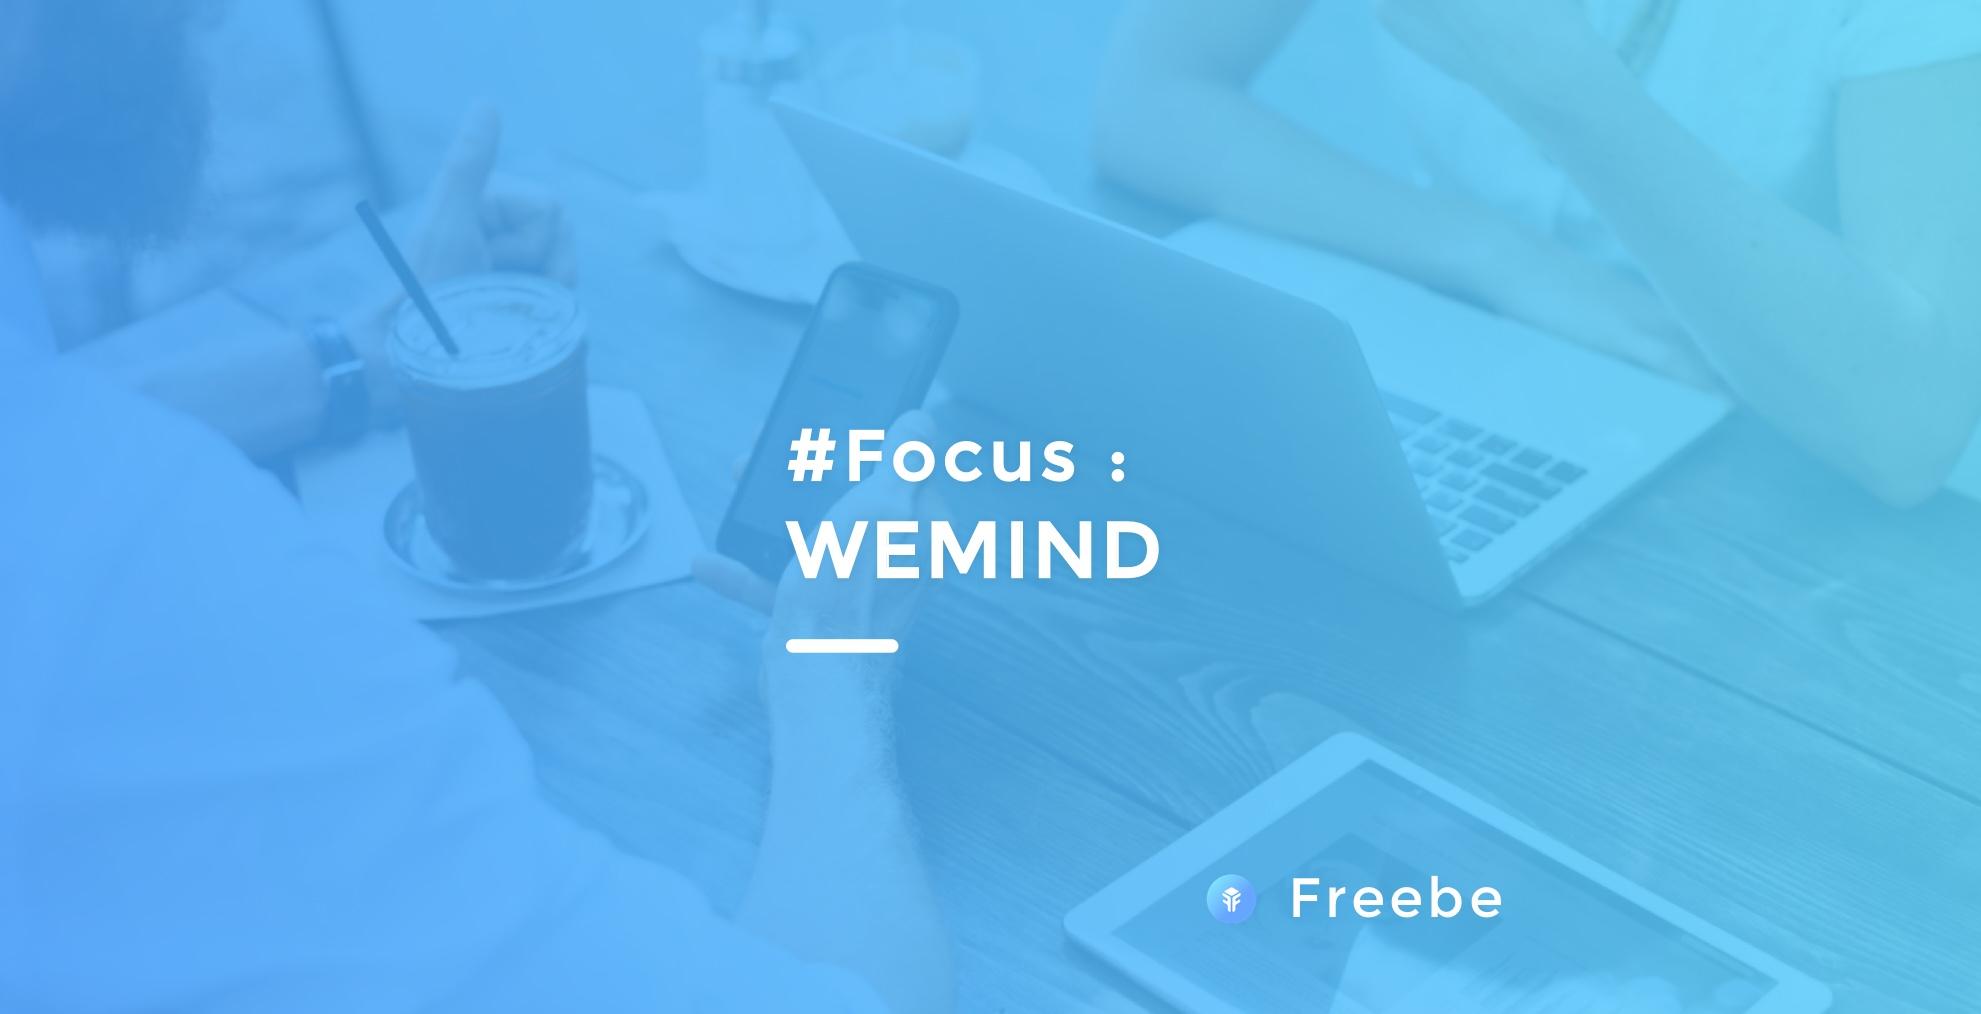 Freebe : #Focus : Wemind